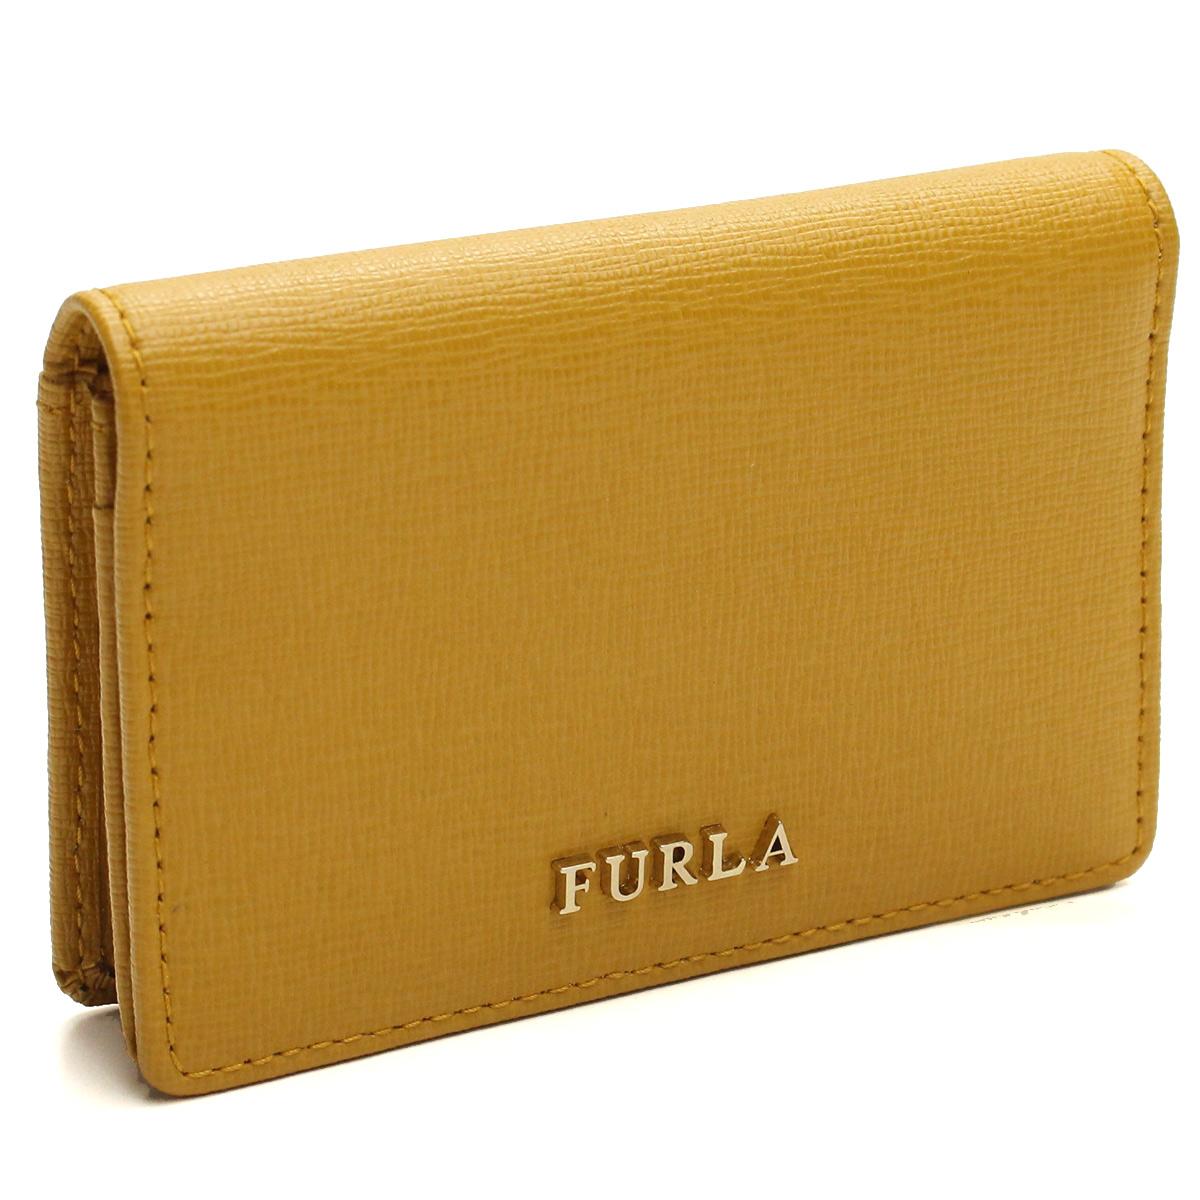 Bighit The total brand wholesale | Rakuten Global Market: FURLA ...